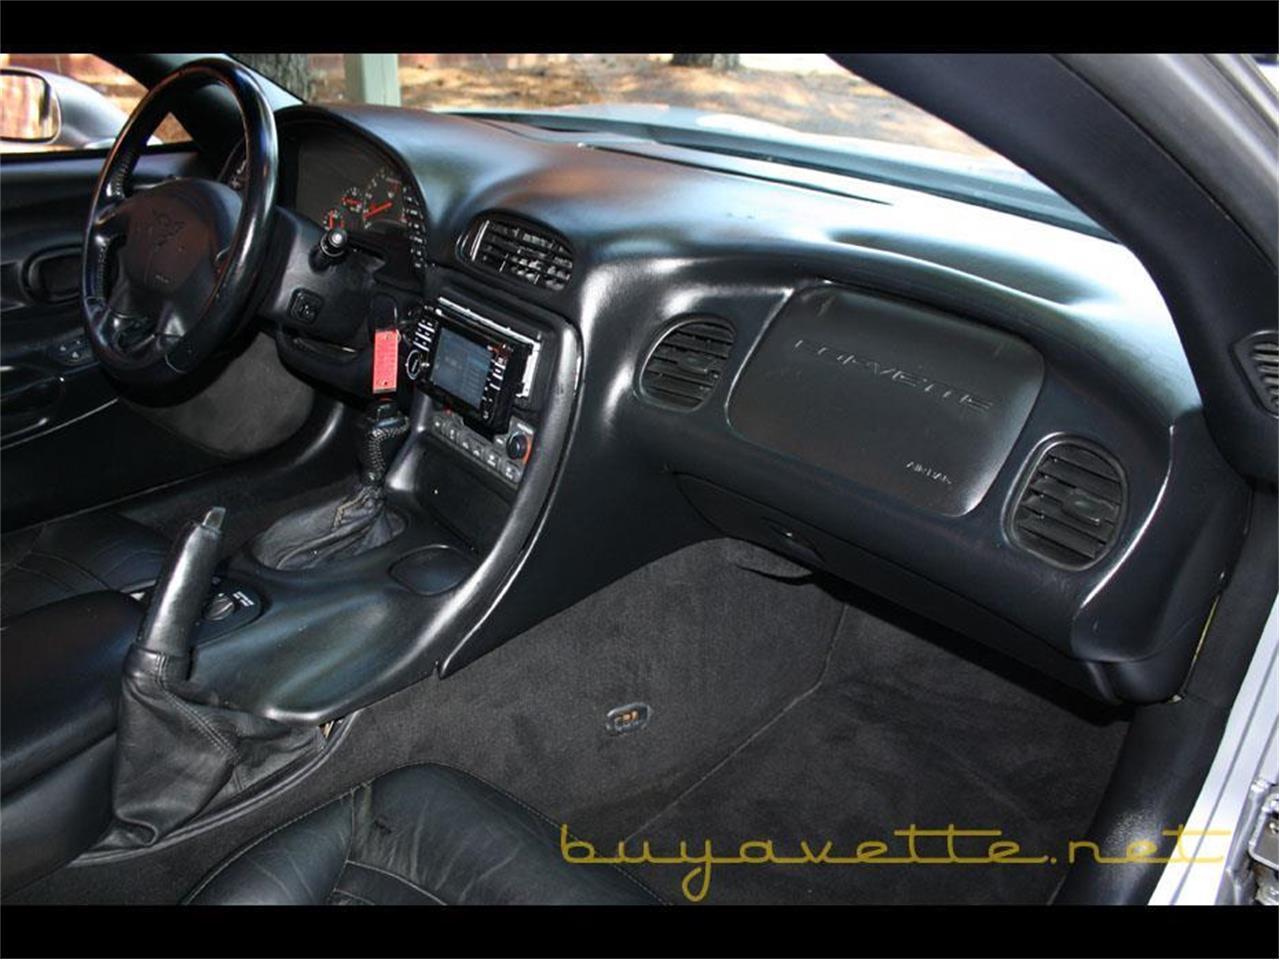 Large Picture of 2002 Chevrolet Corvette located in Atlanta Georgia - $15,991.00 - JALL